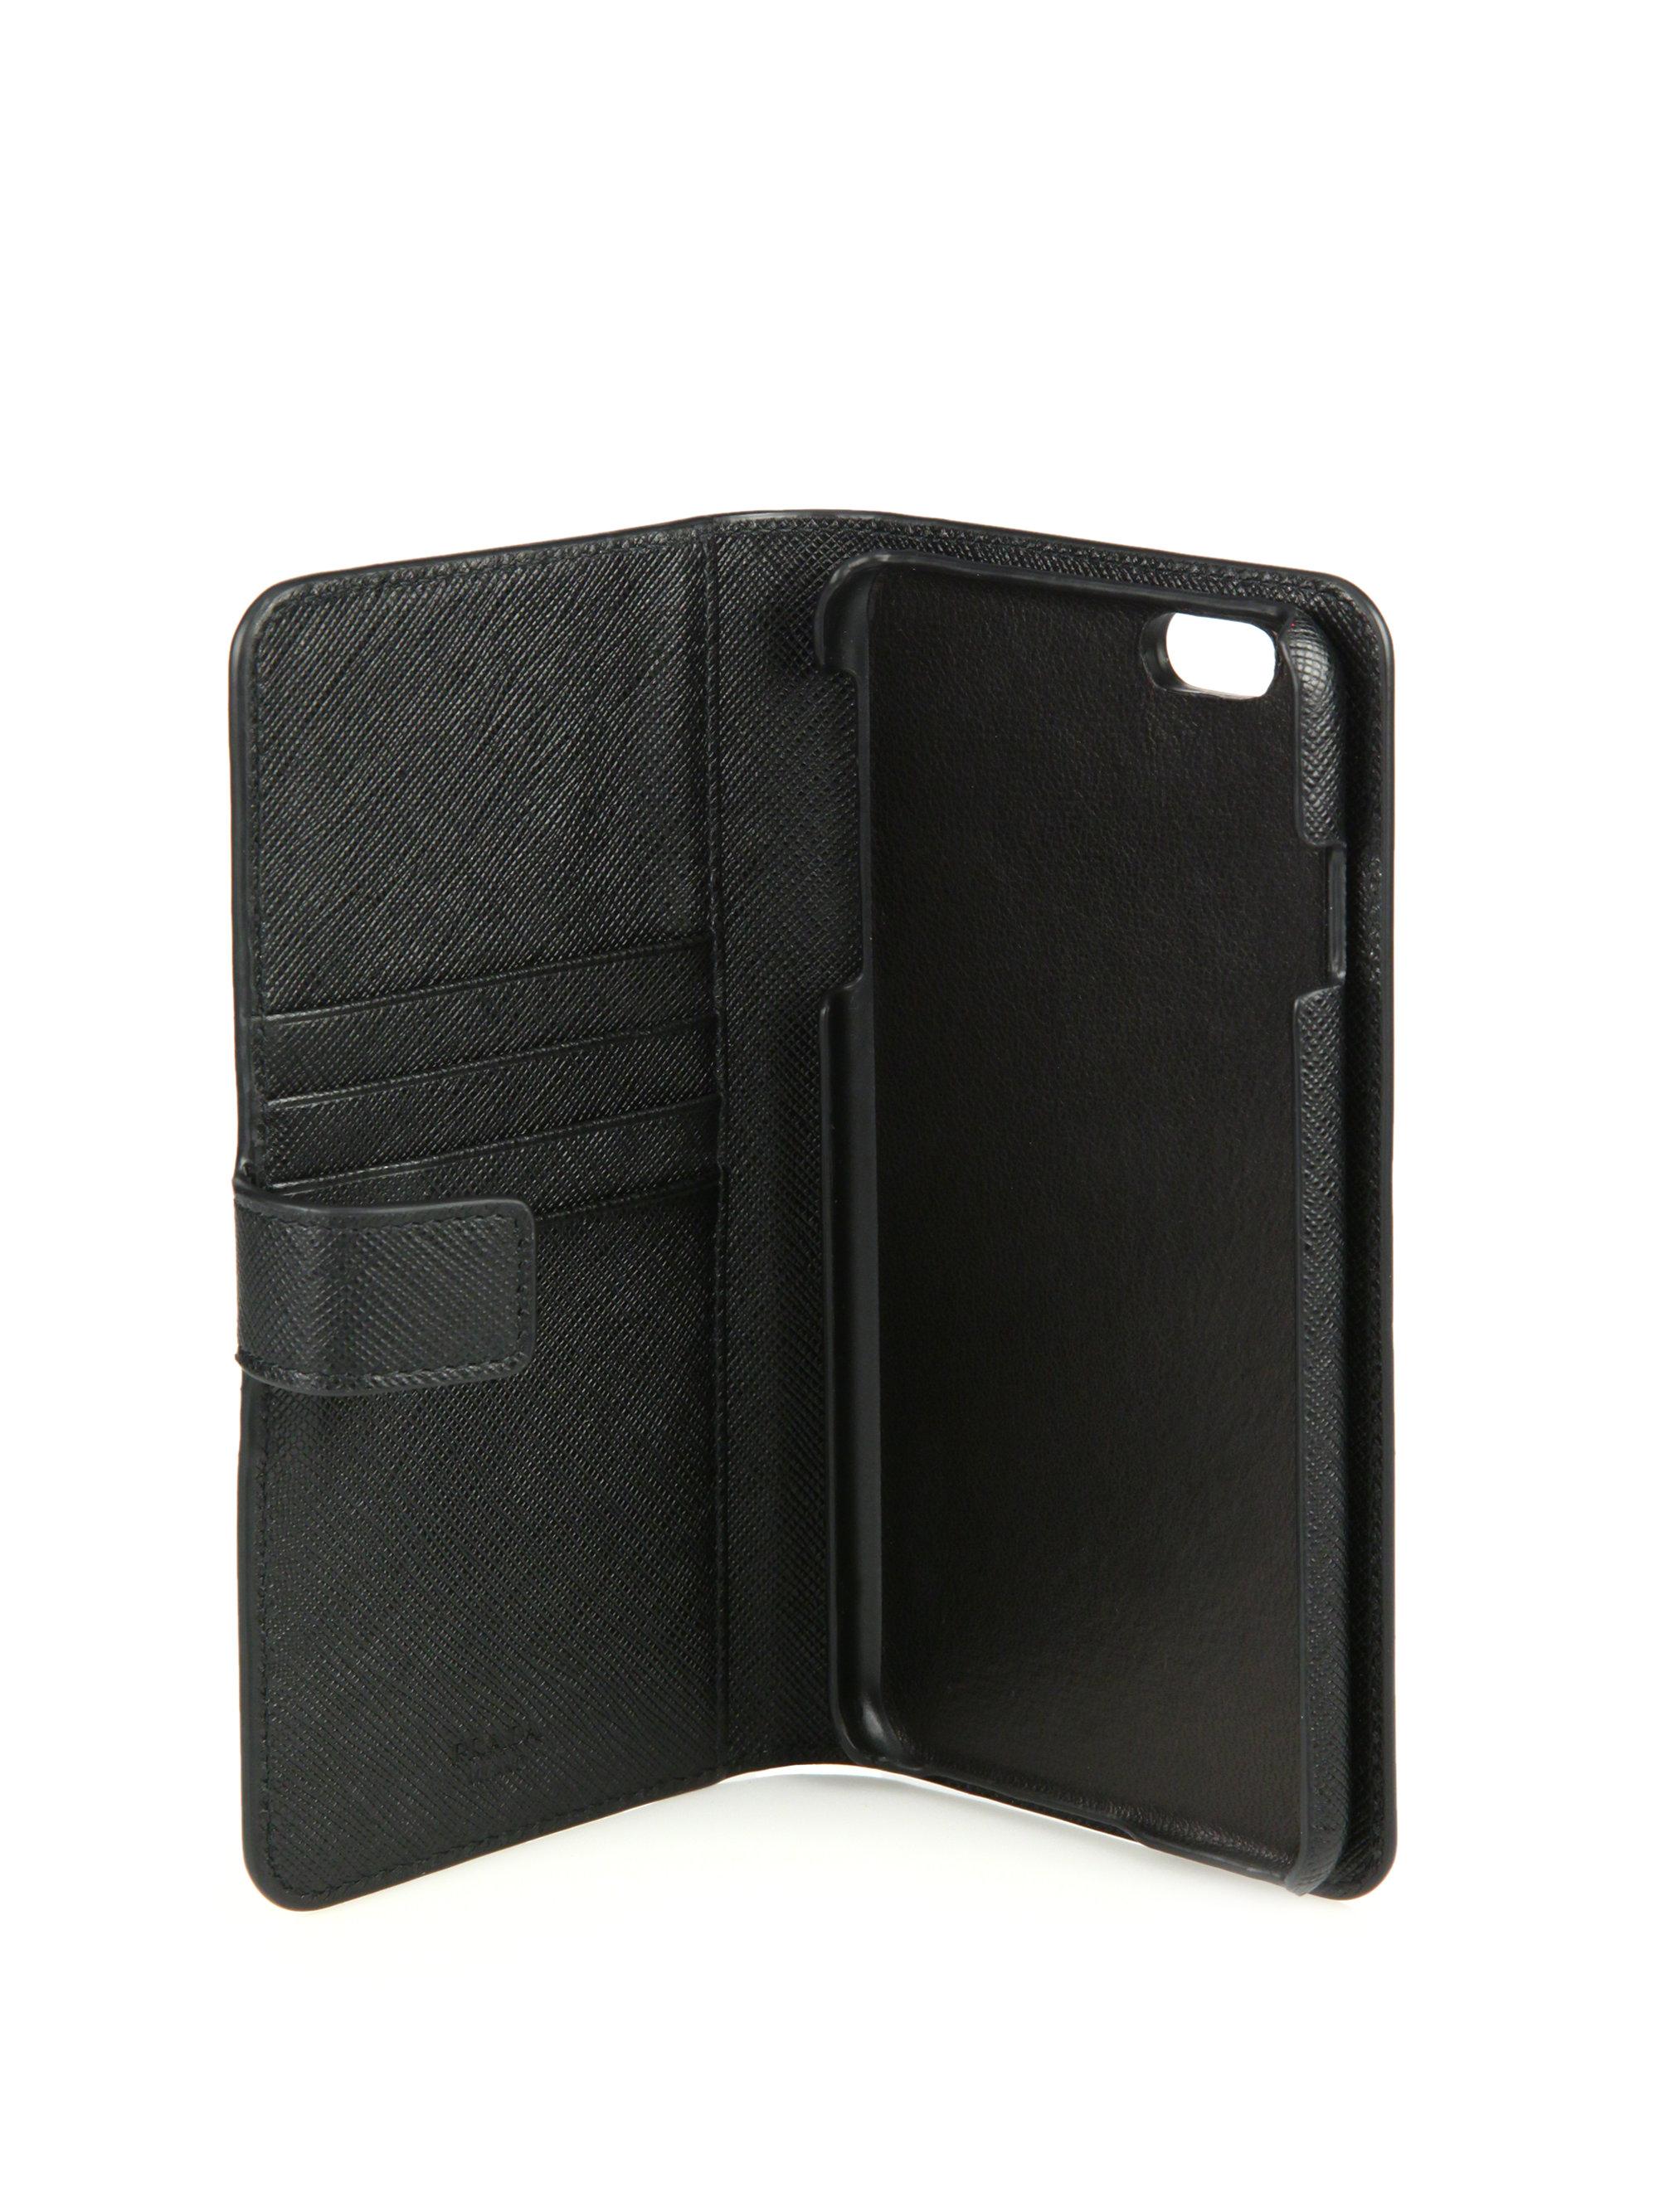 new styles 928a1 c858e Prada Black Iphone 6 Plus Holder & Wallet for men